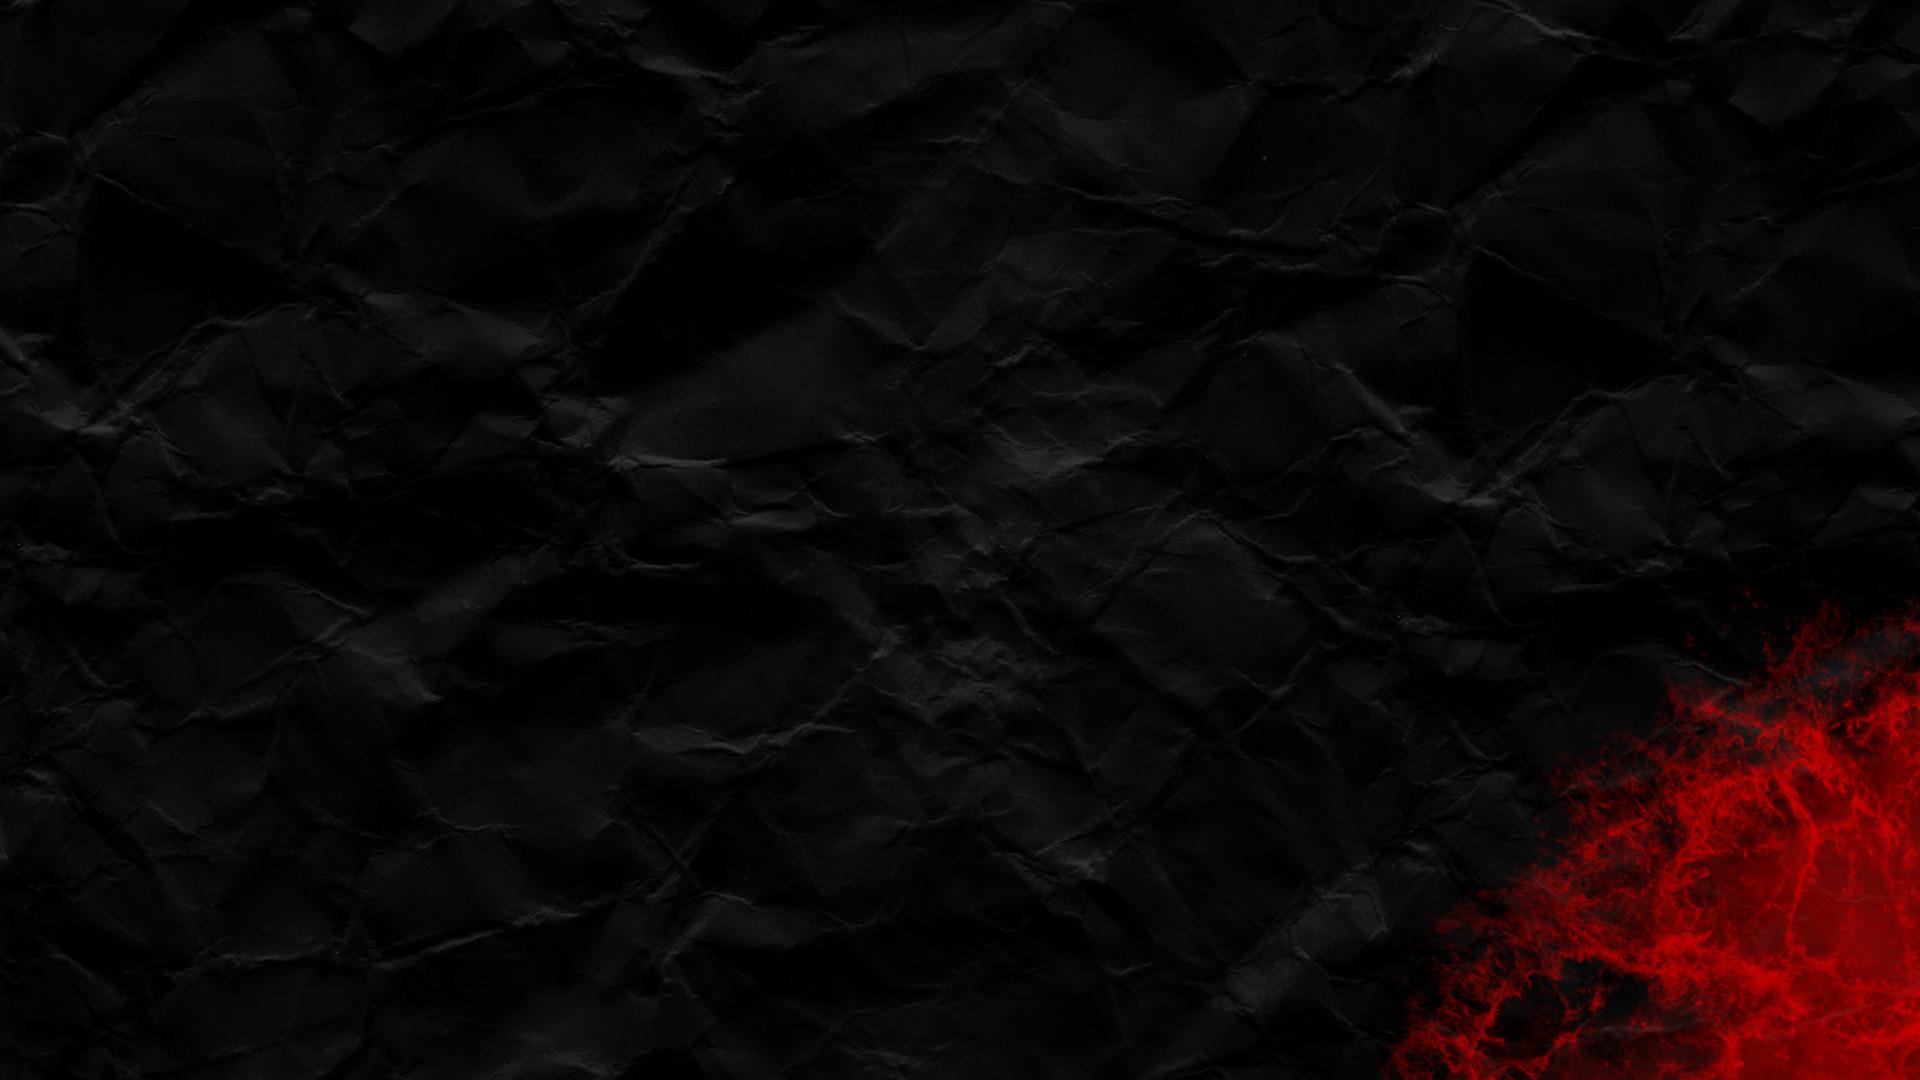 Black And Red Desktop Backgrounds …